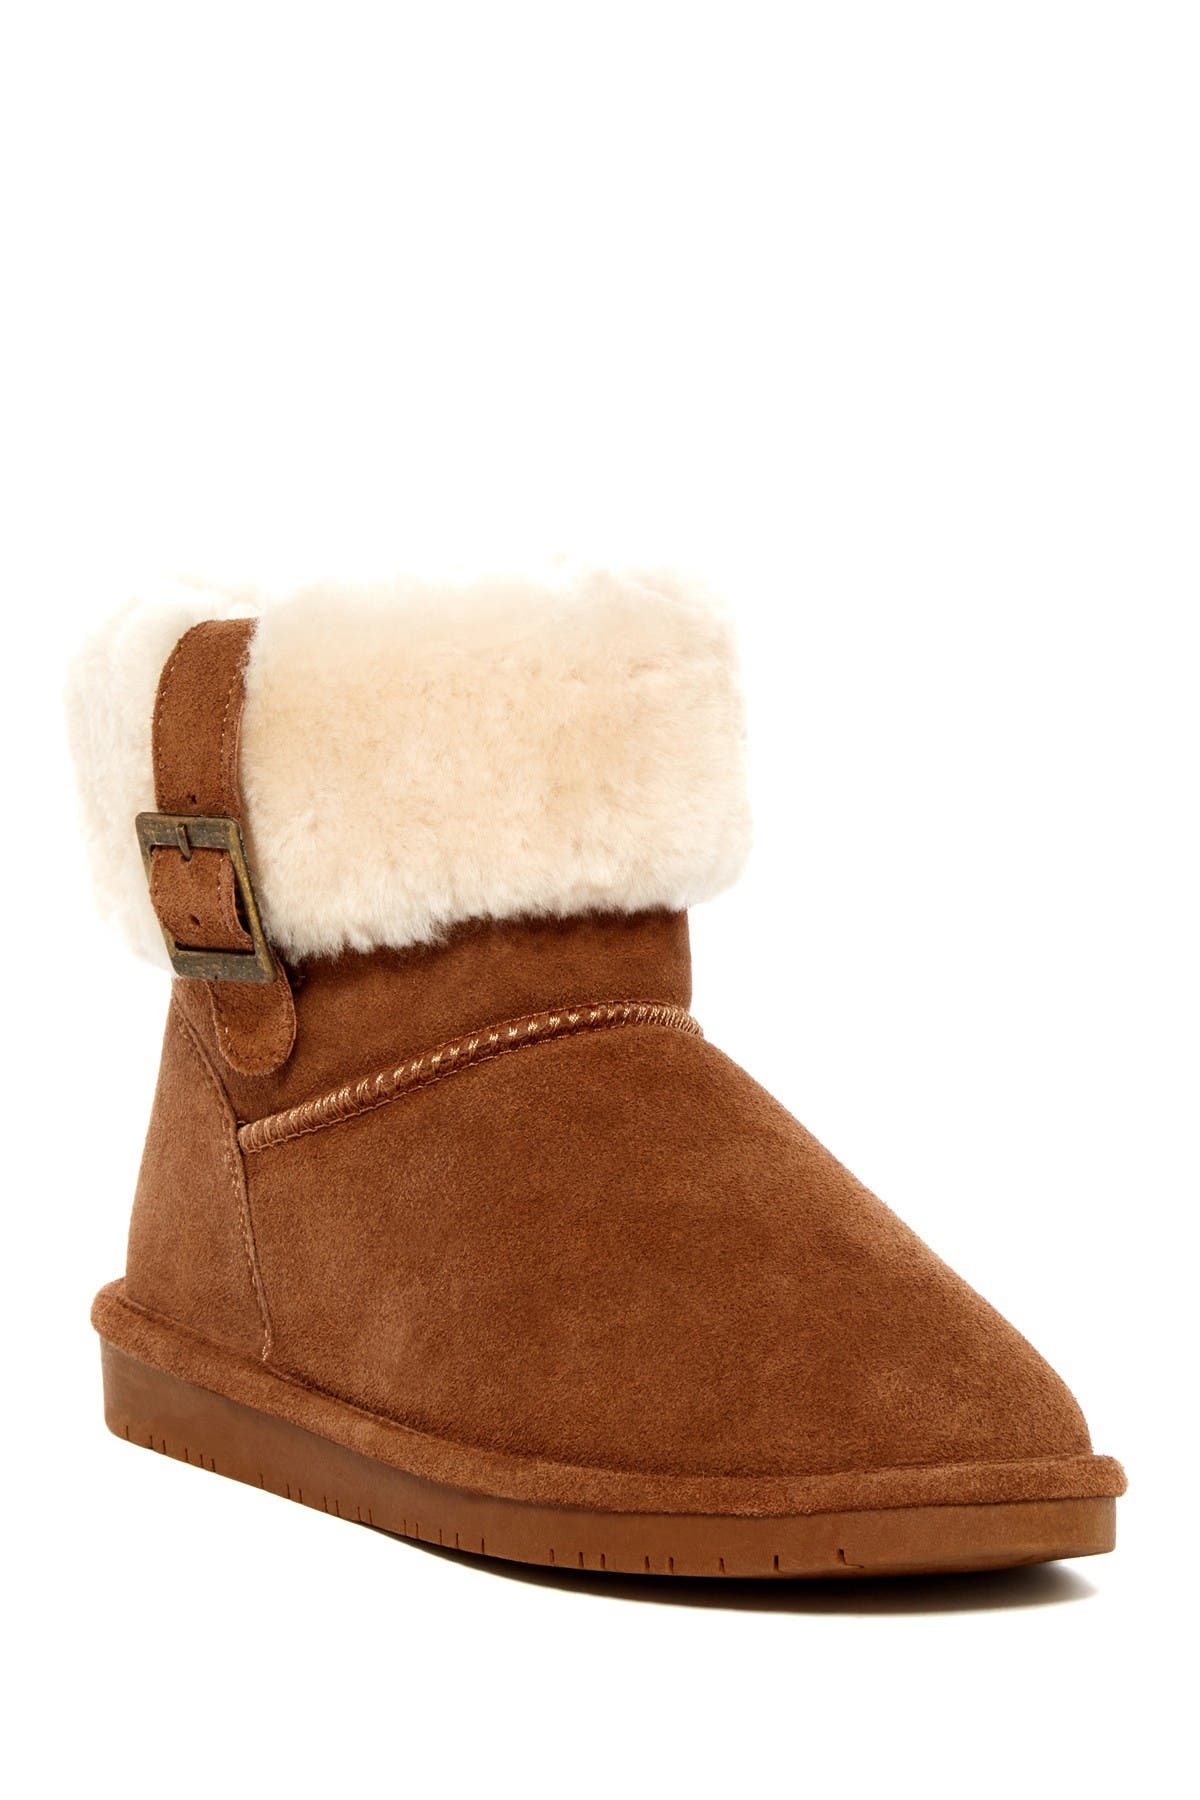 Image of BEARPAW Abby Genuine Sheepskin Lined Boot